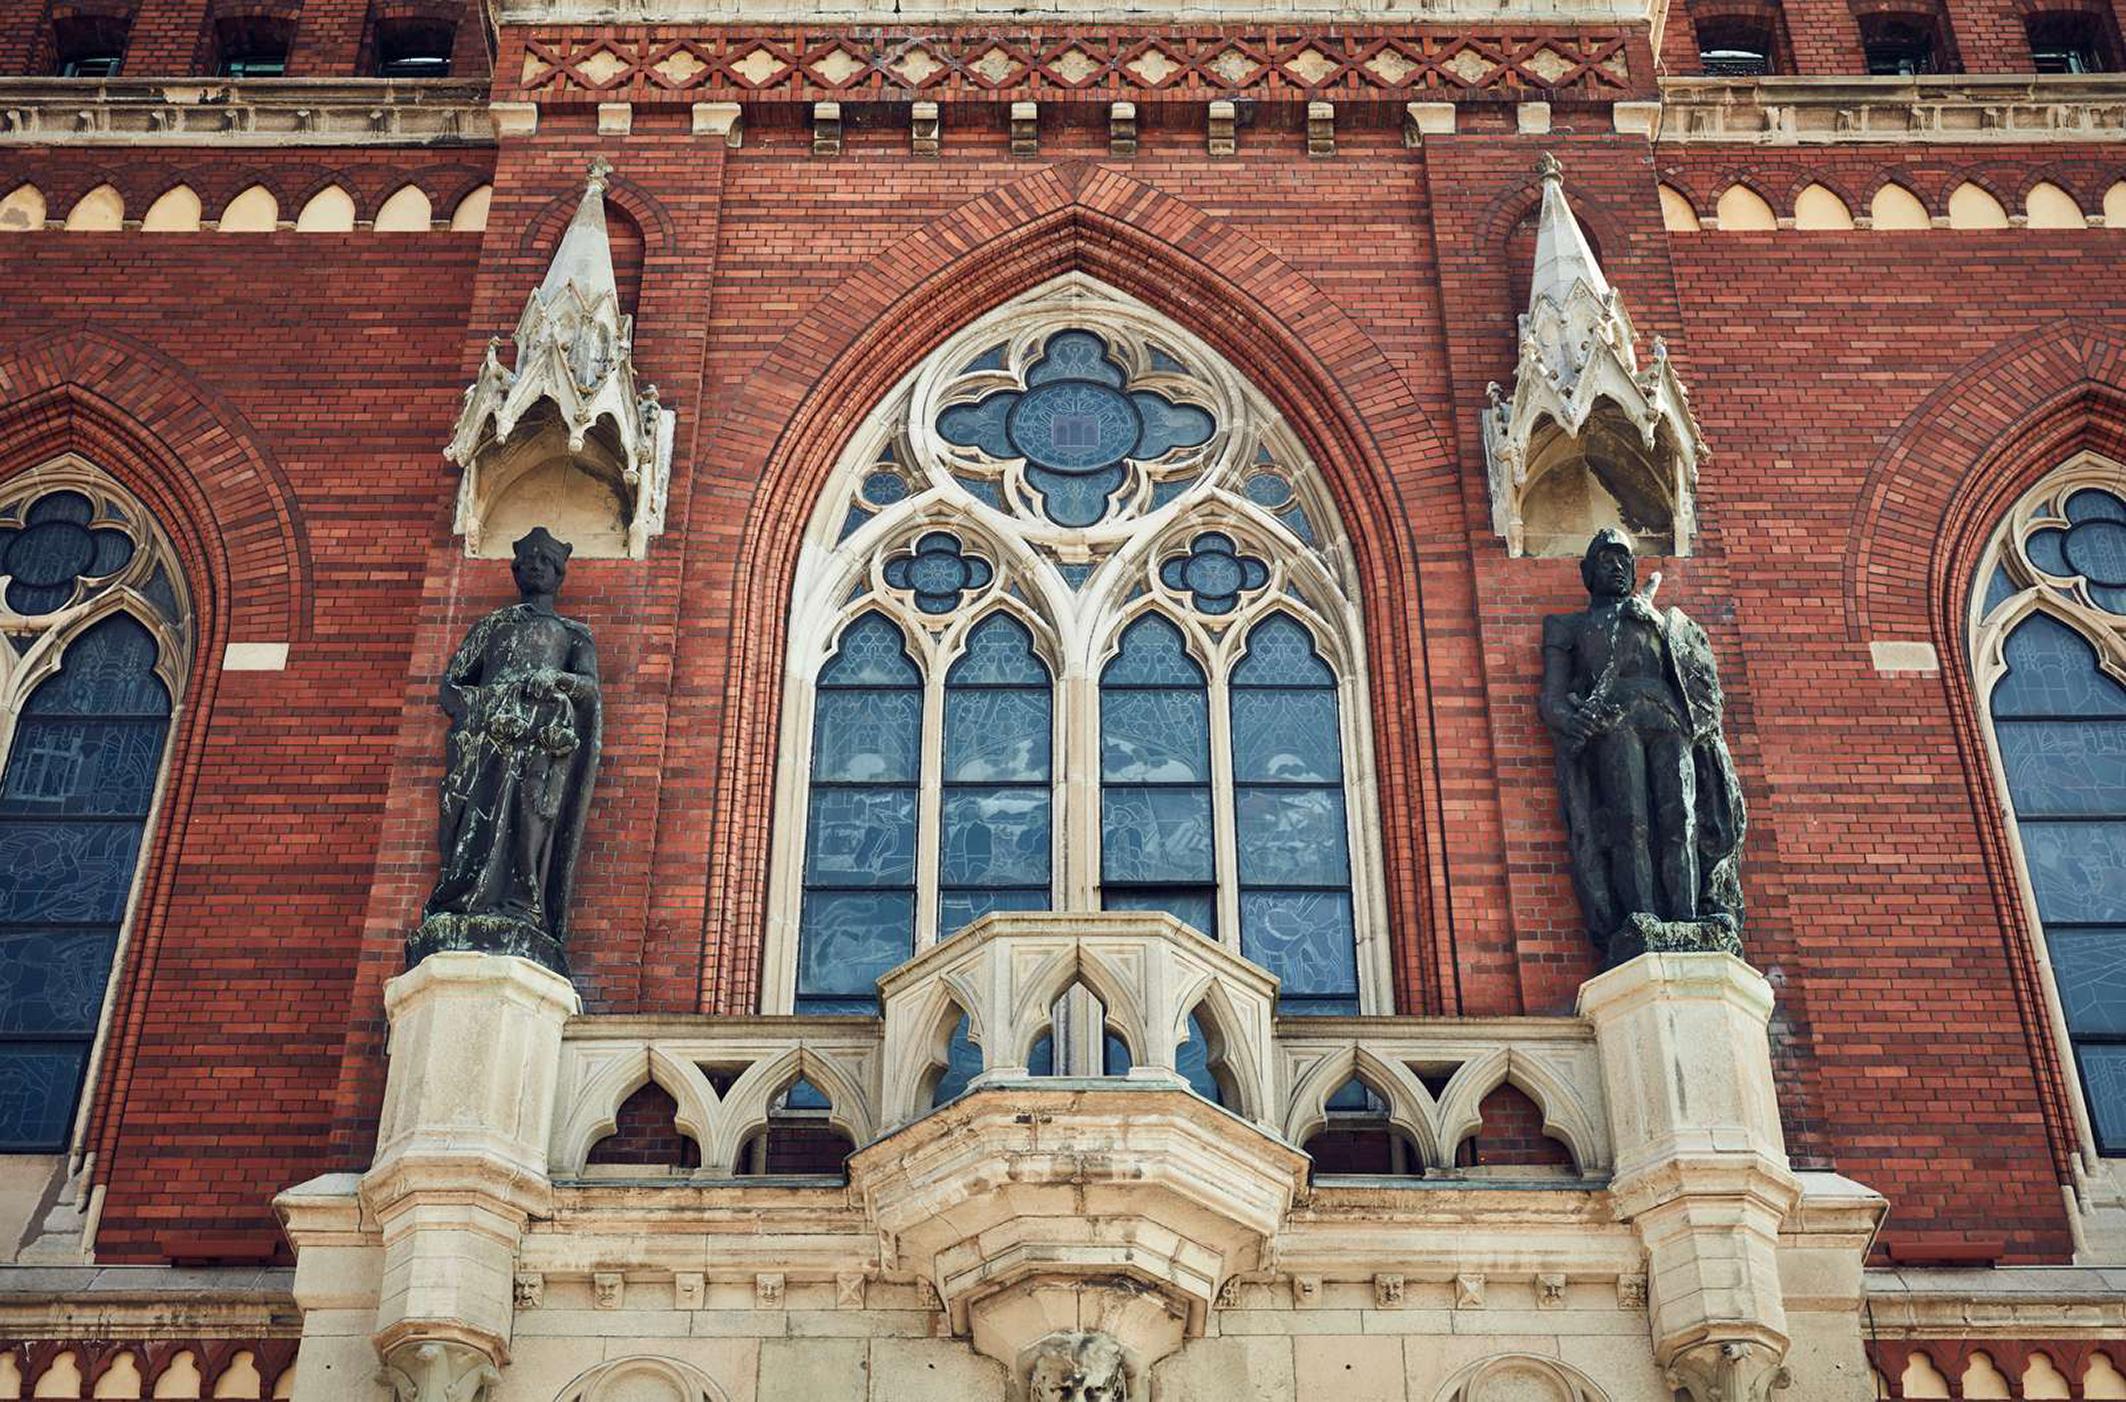 Två statyer på utsidan av rådhuset